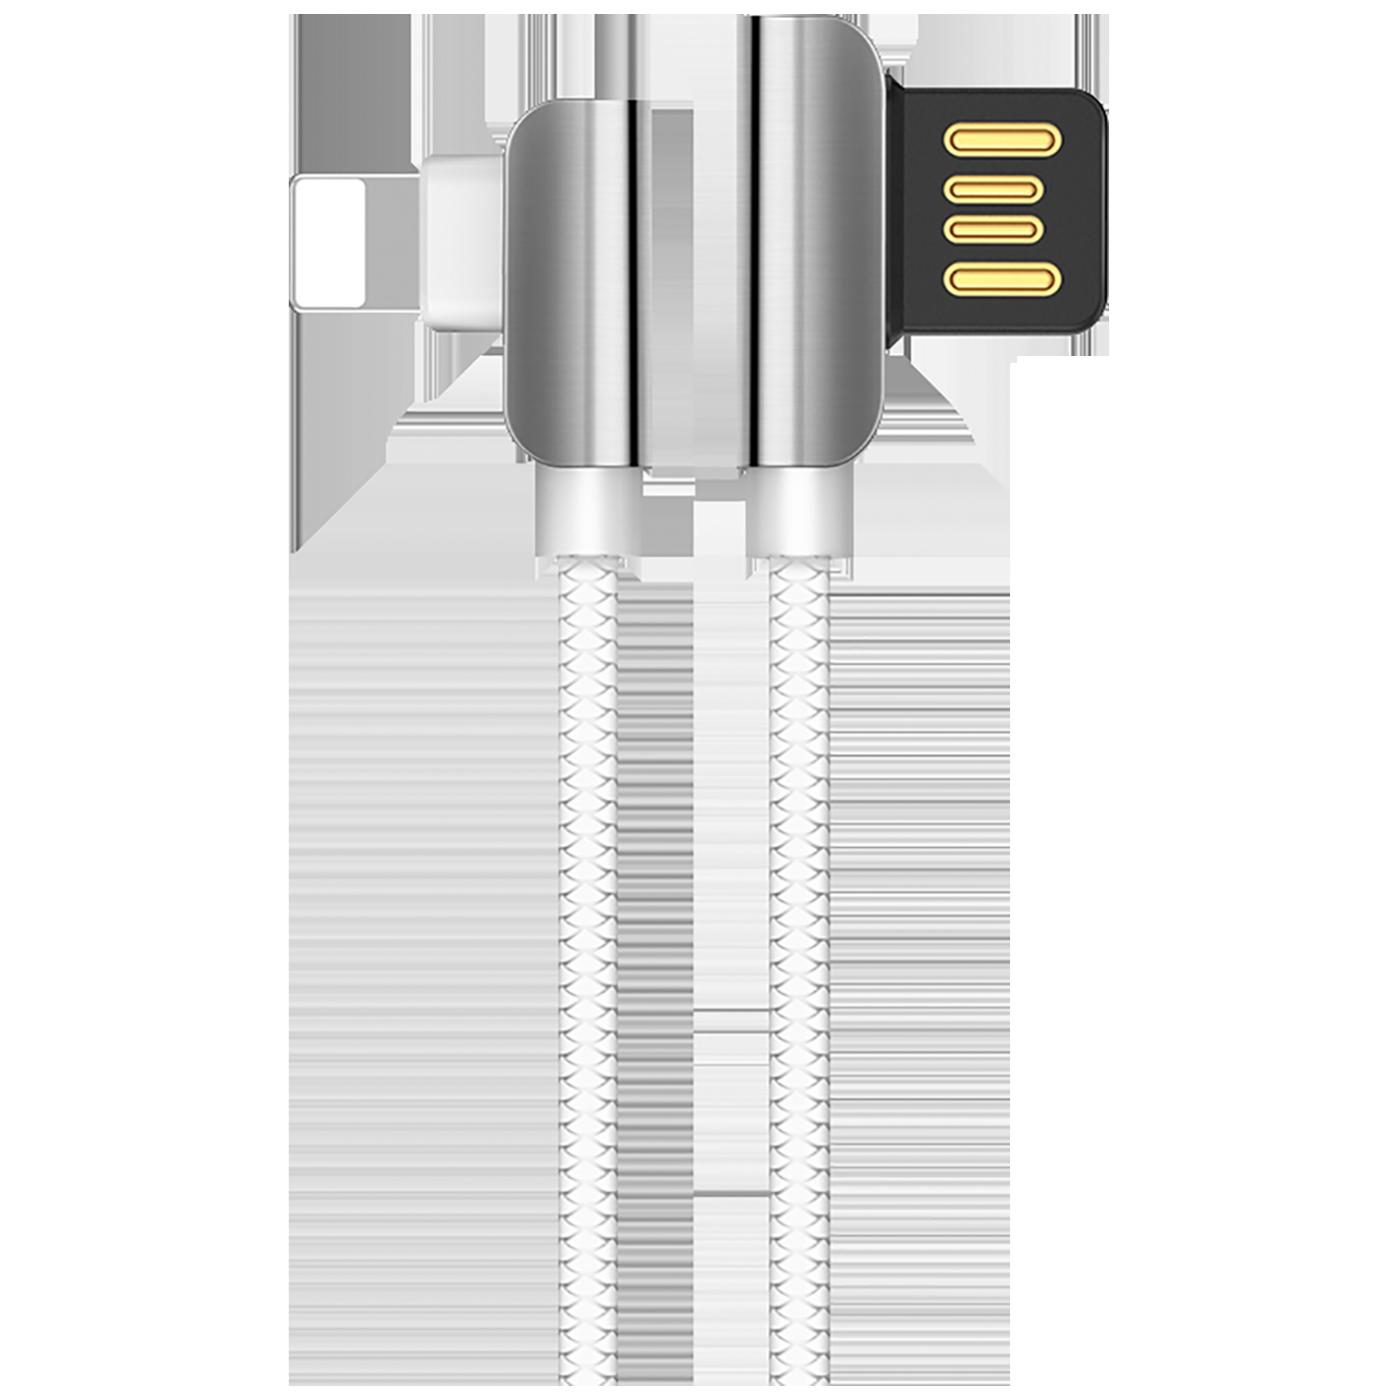 USB kabl za iPhone, Lightning kabl, 1.2 met., 2.4 A,bijela